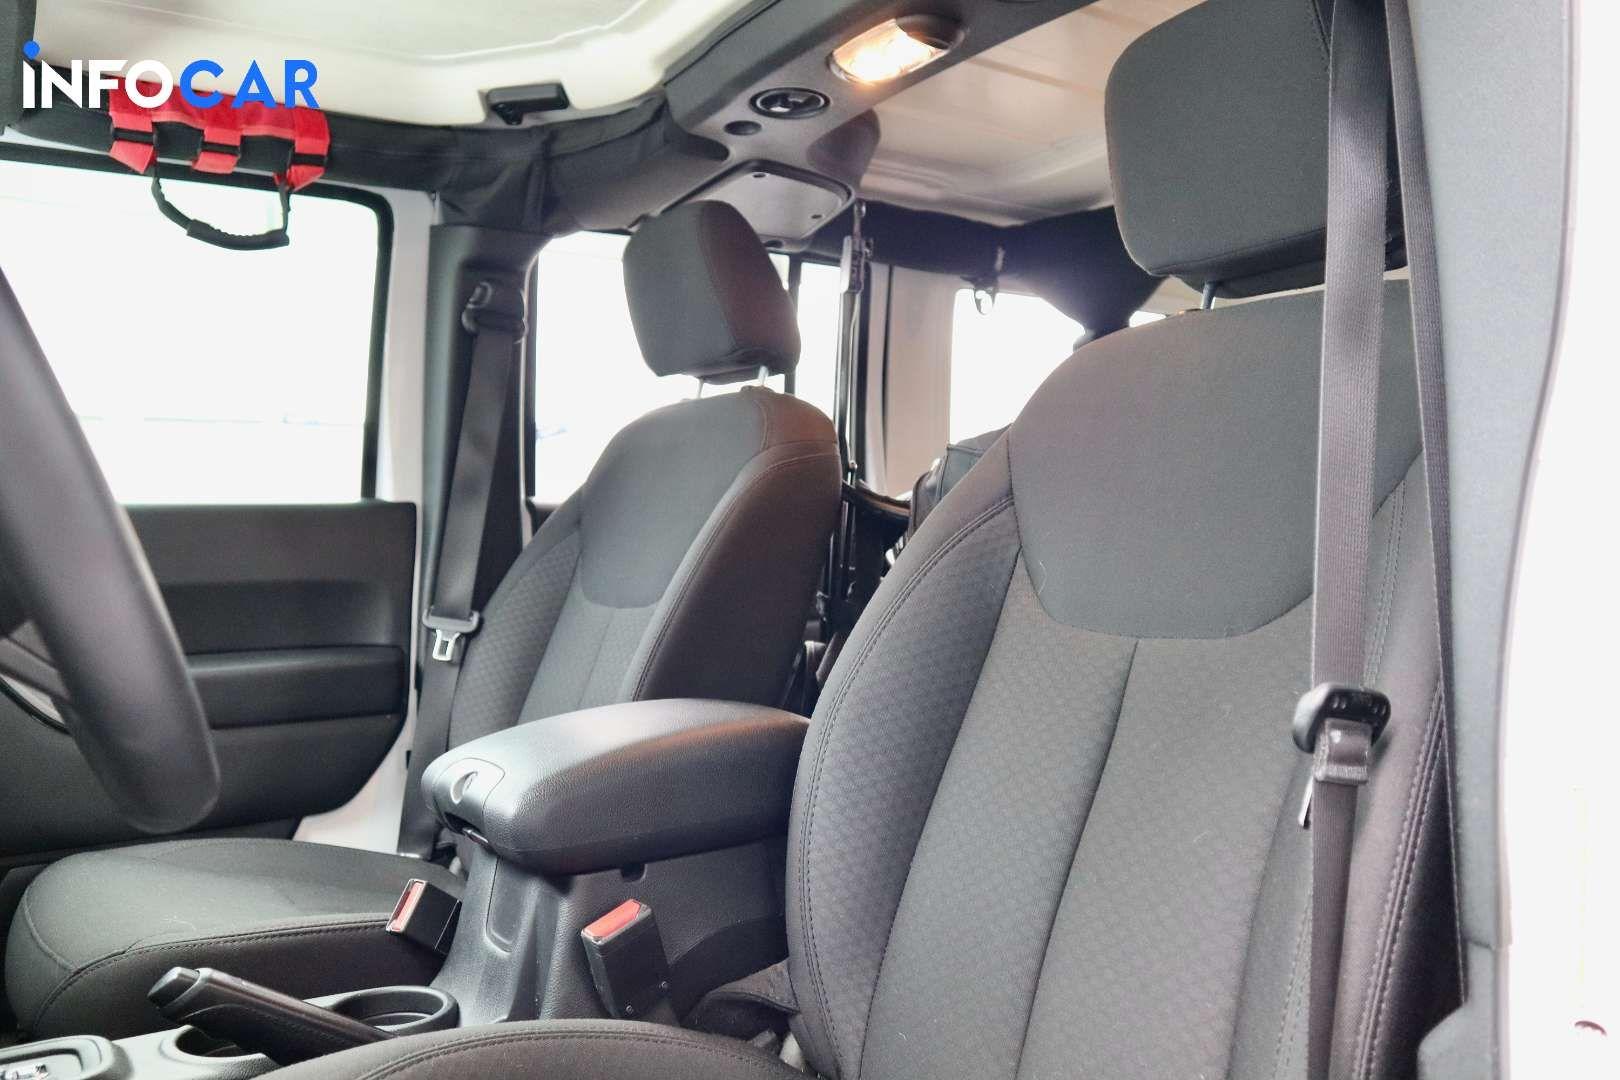 2018 Jeep Wrangler Unlimit Sport JK - INFOCAR - Toronto's Most Comprehensive New and Used Auto Trading Platform